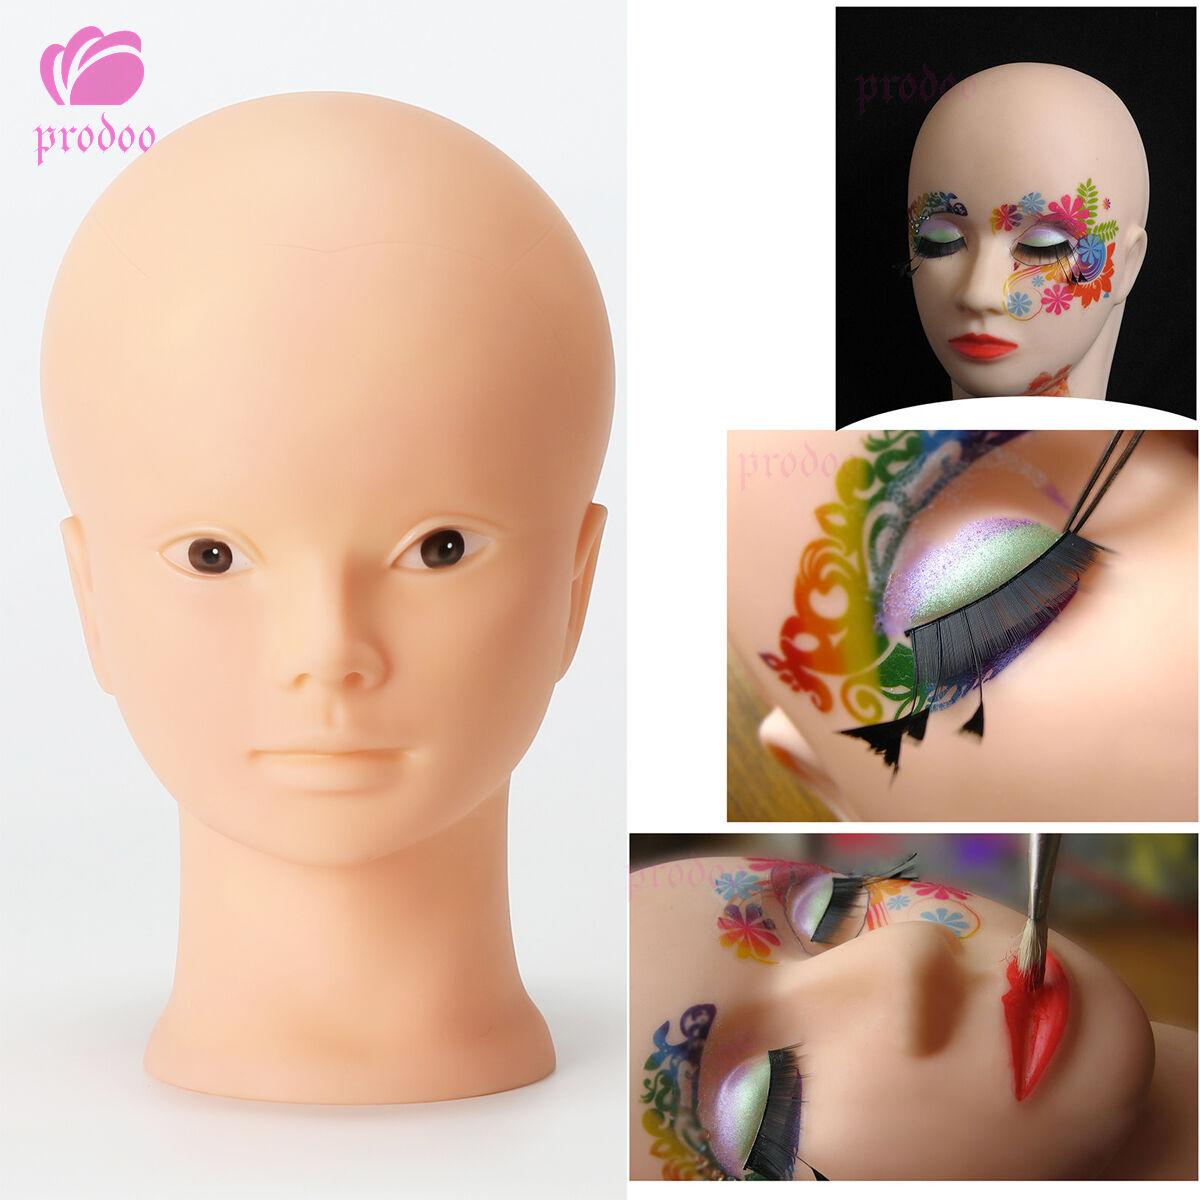 Details about Female Practice Mannequin Manikin Head Eyelashes Lip Makeup Massage Training